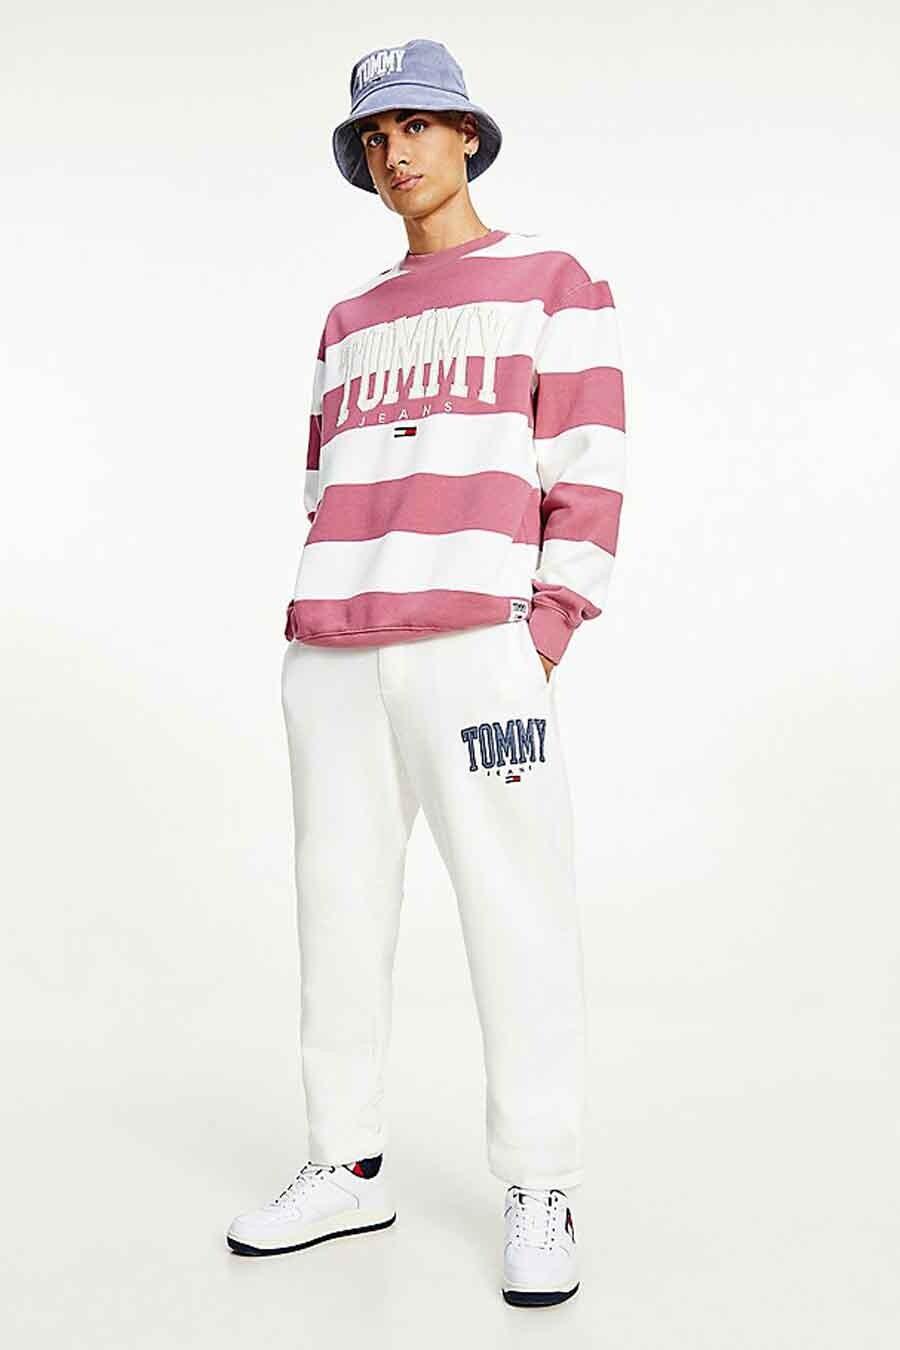 Tommy Jeans Jogging, Wit, Heren, Maat: L/M/S/XL/XS